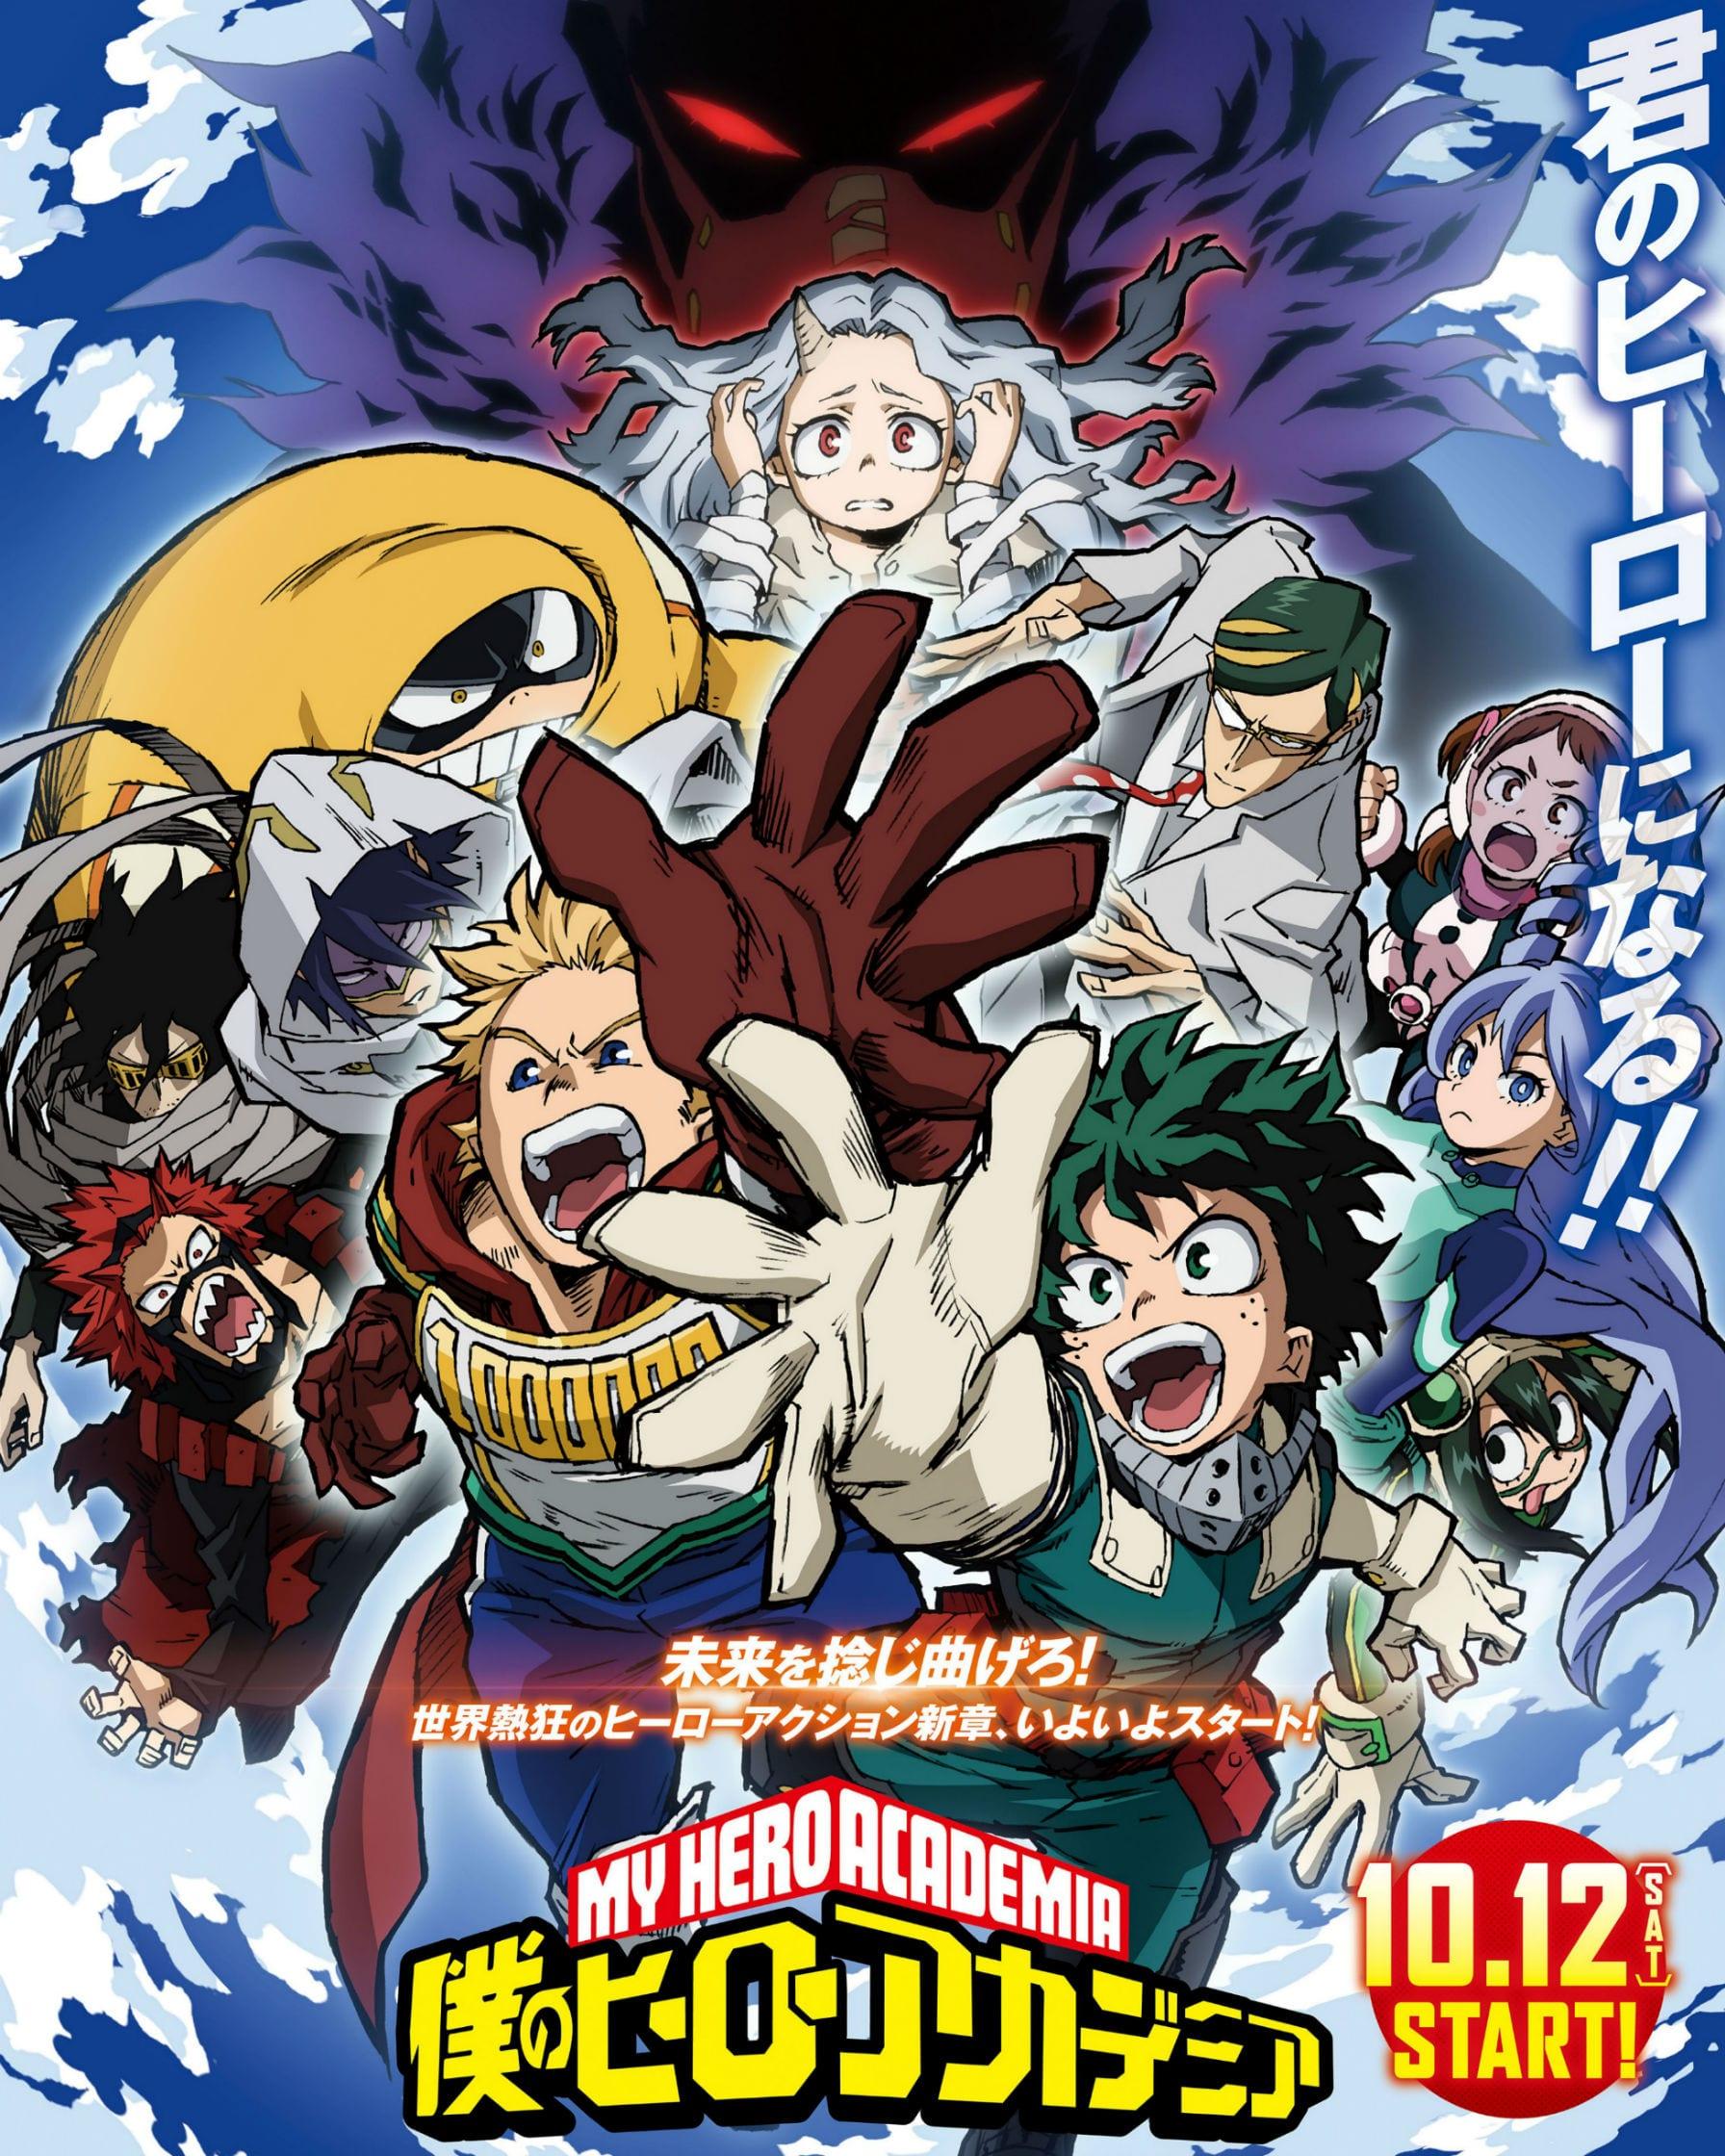 https://mirai.ai/wp-content/uploads/Boku-no-Hero-Academia-4th-Season-v1.jpg